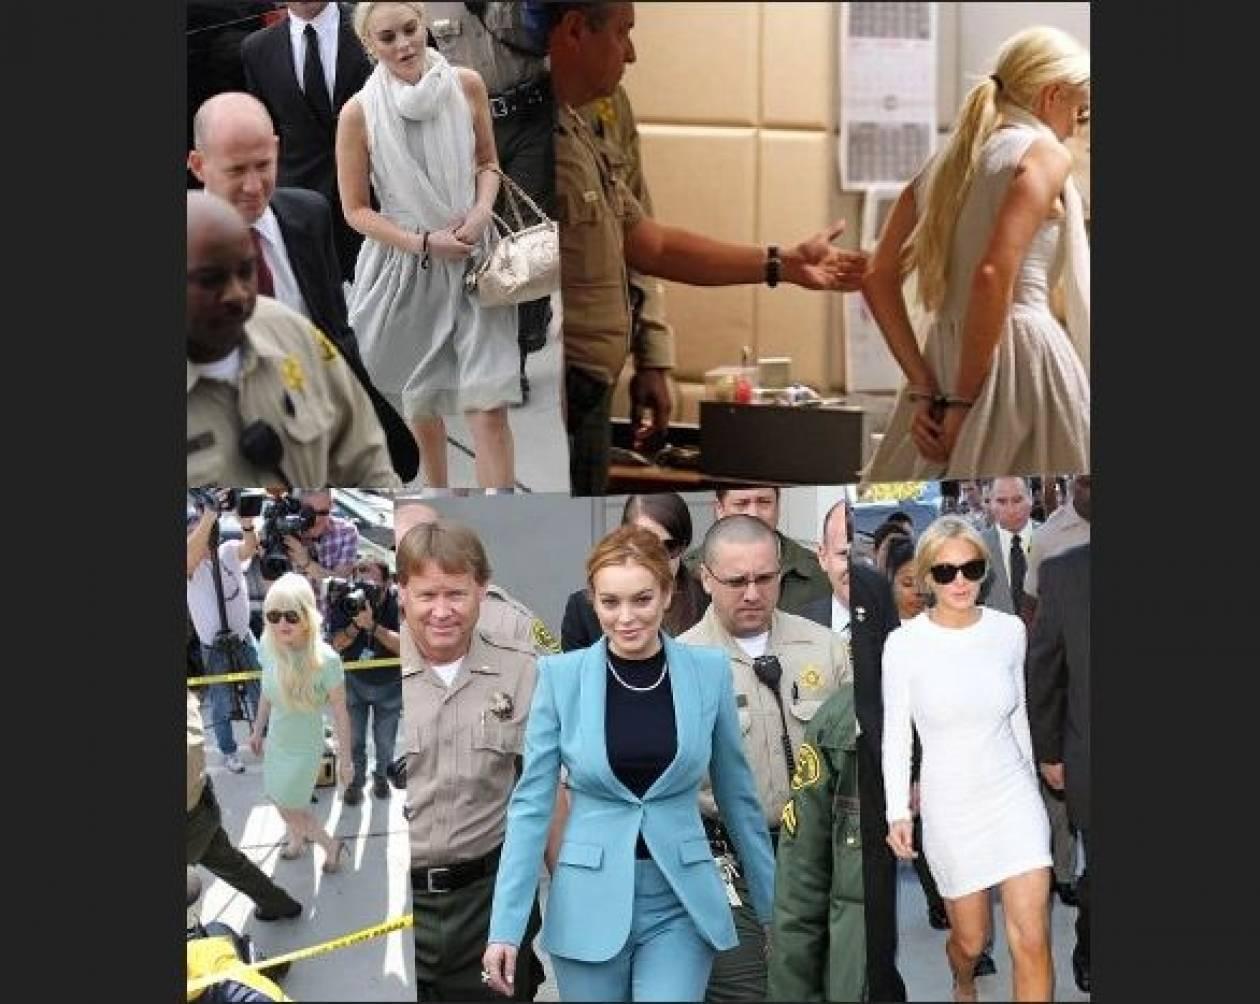 Lindsay Lohan: Οι αμέτρητες εμφανίσεις στα δικαστήρια